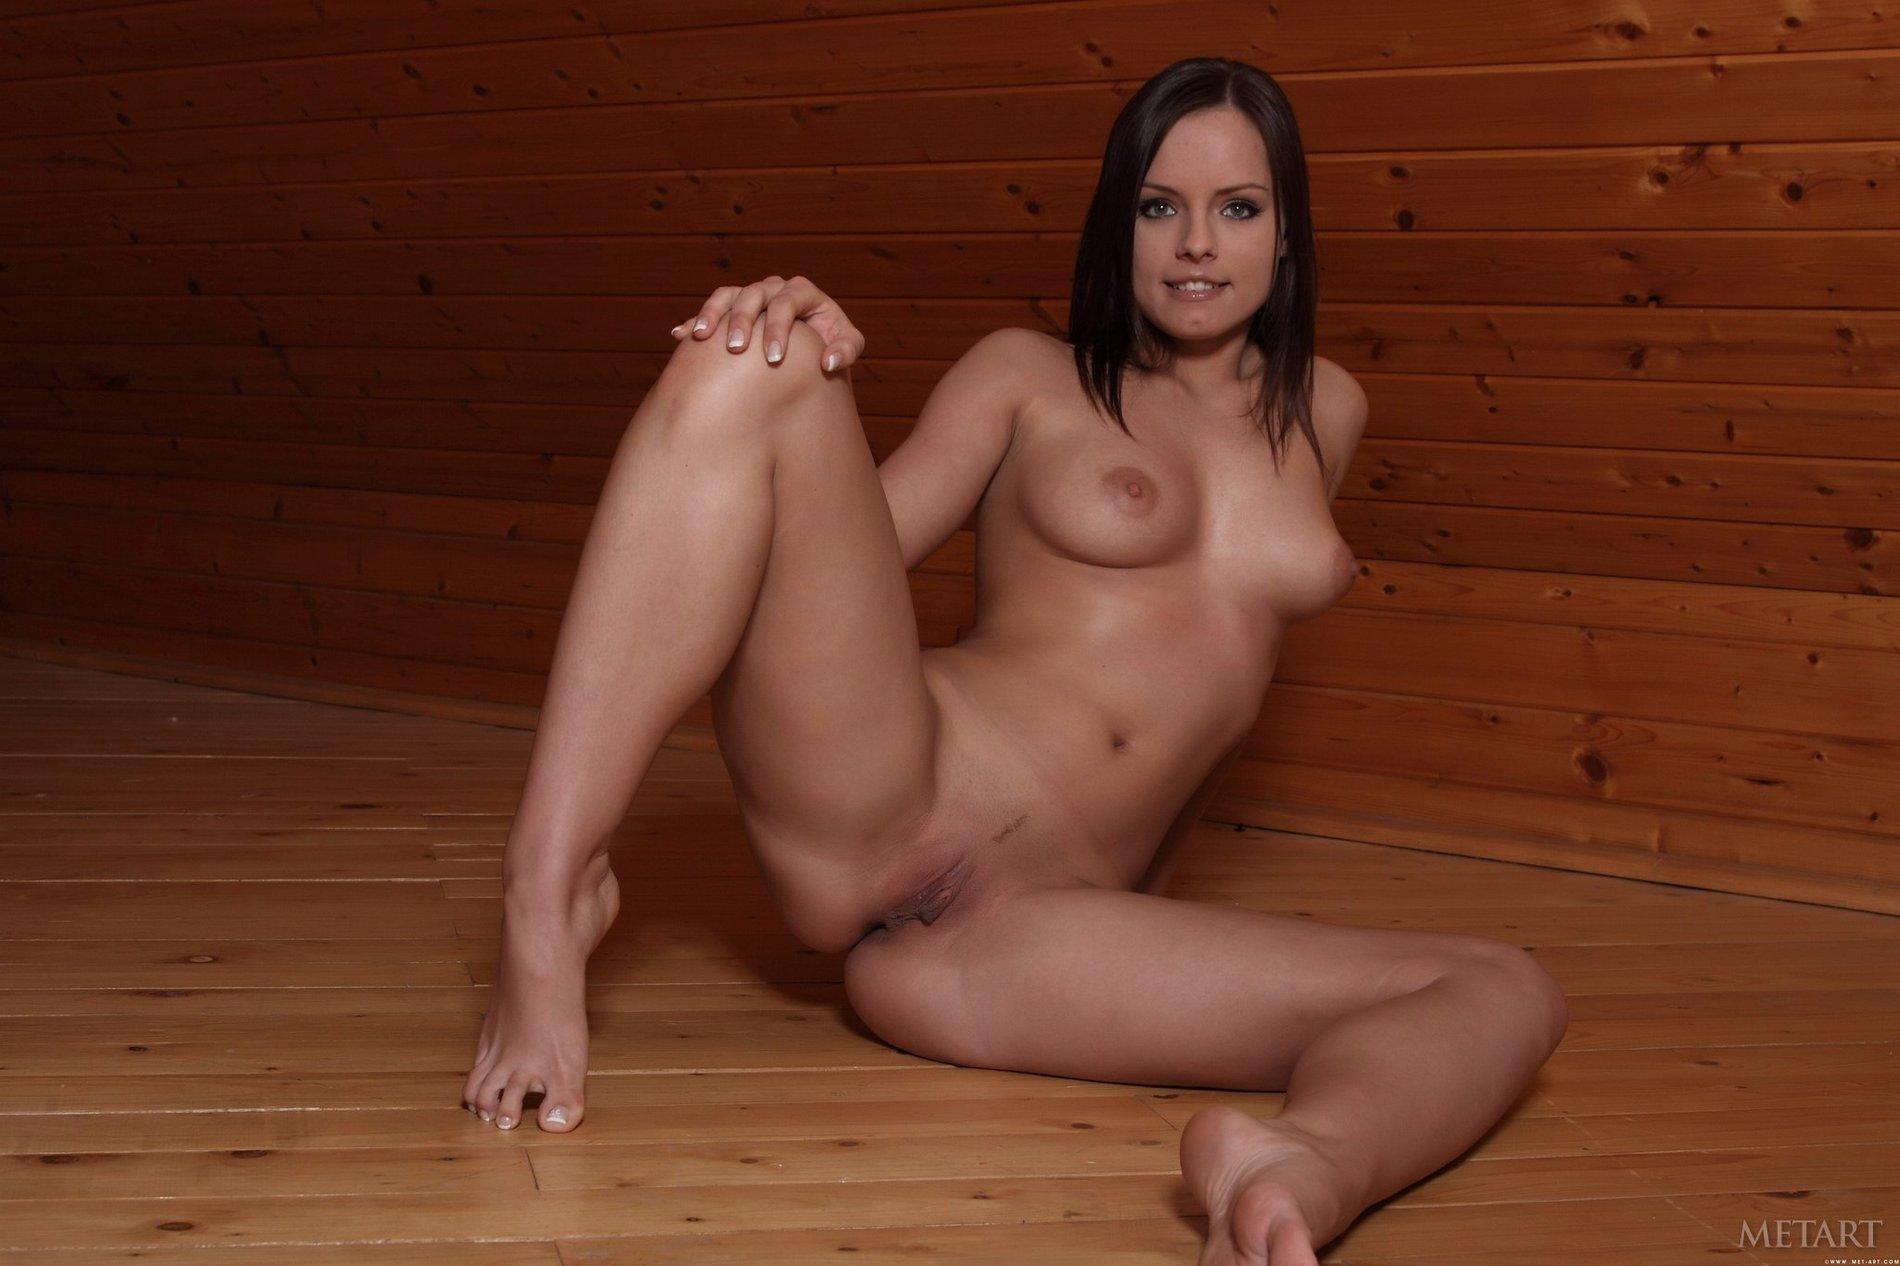 Best Kari Sweets Fully Nude Photos